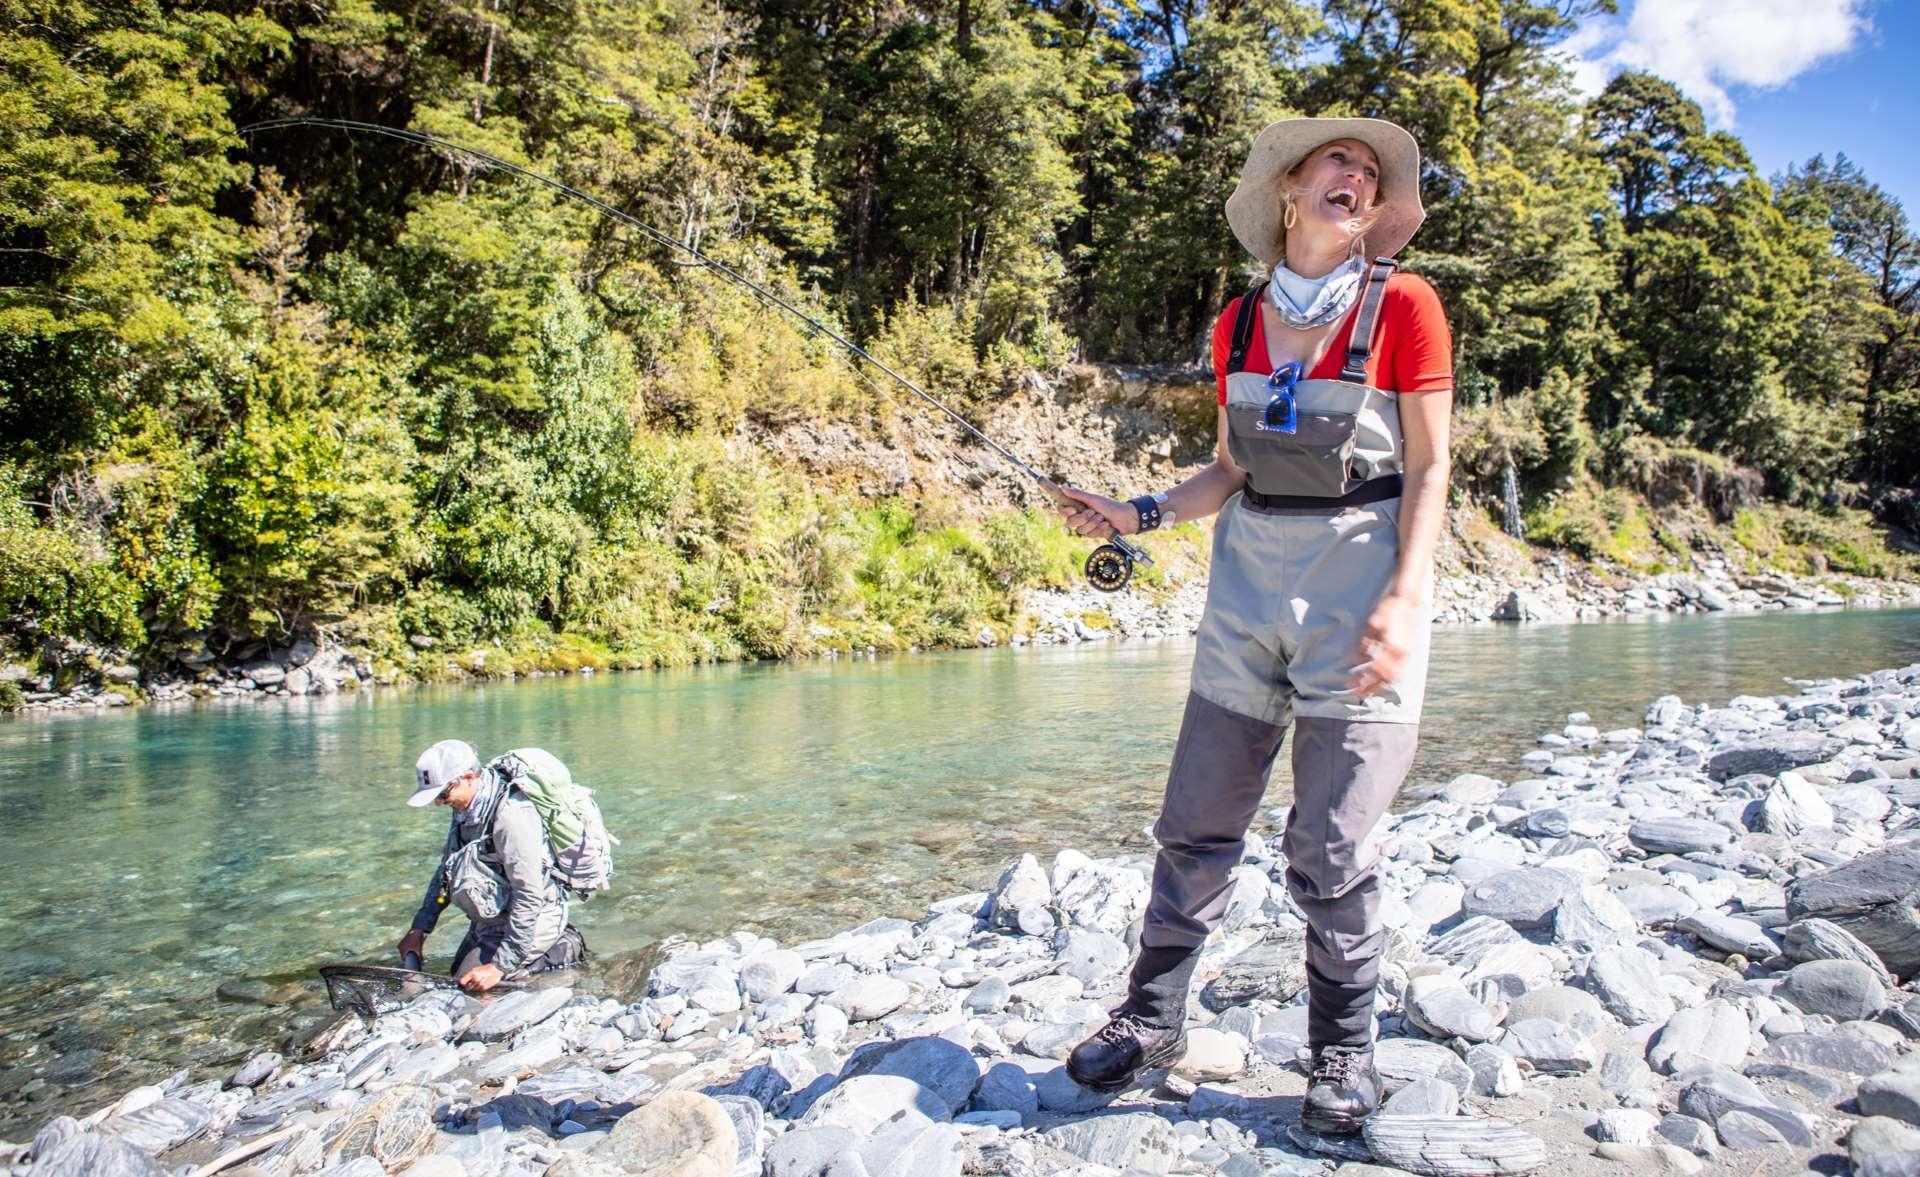 Women's fly fishing adventure